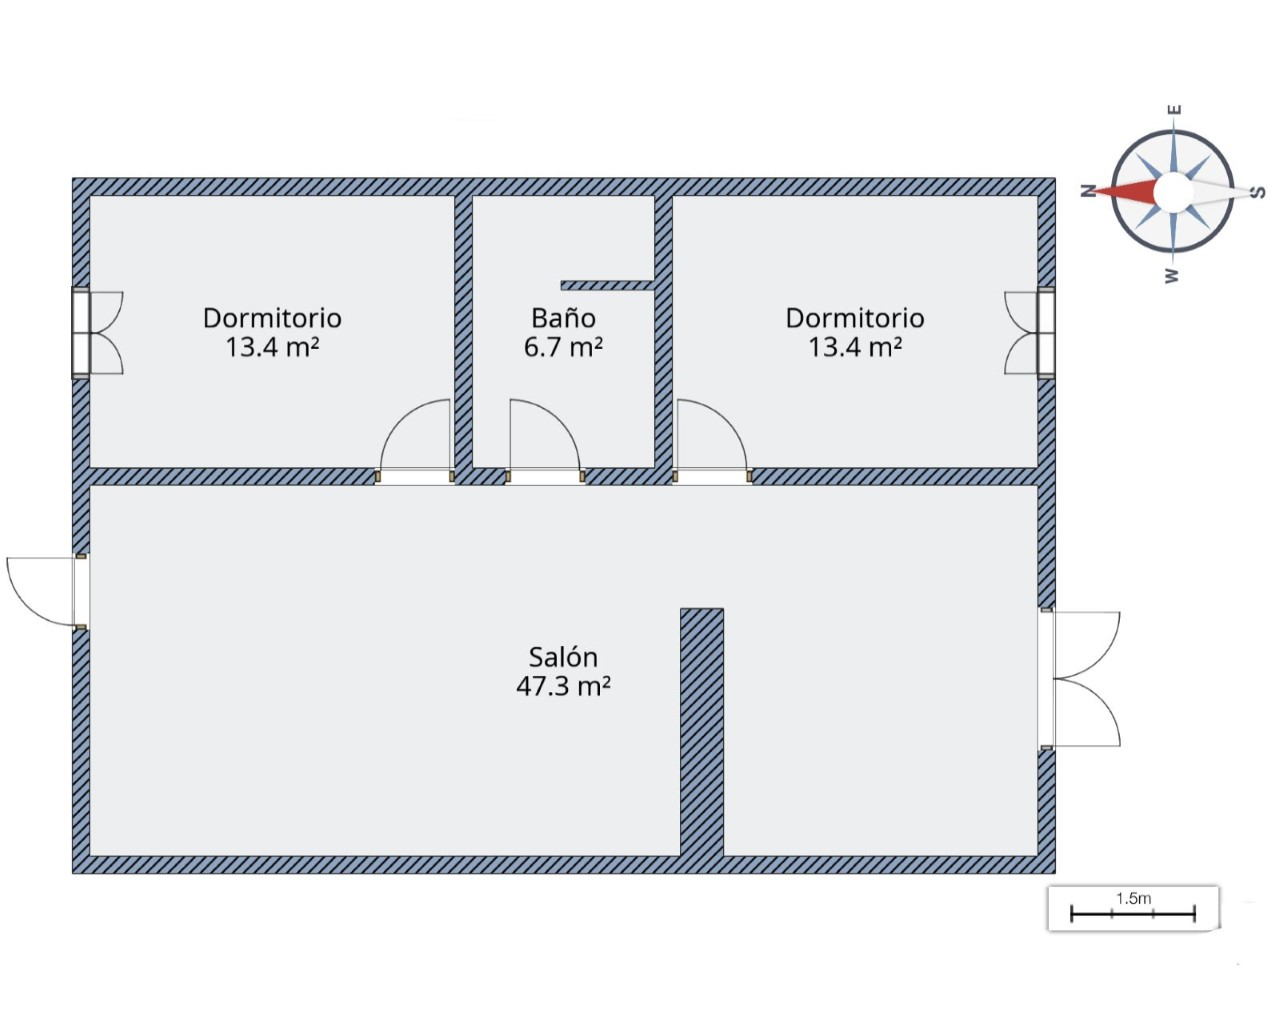 Annexe plan